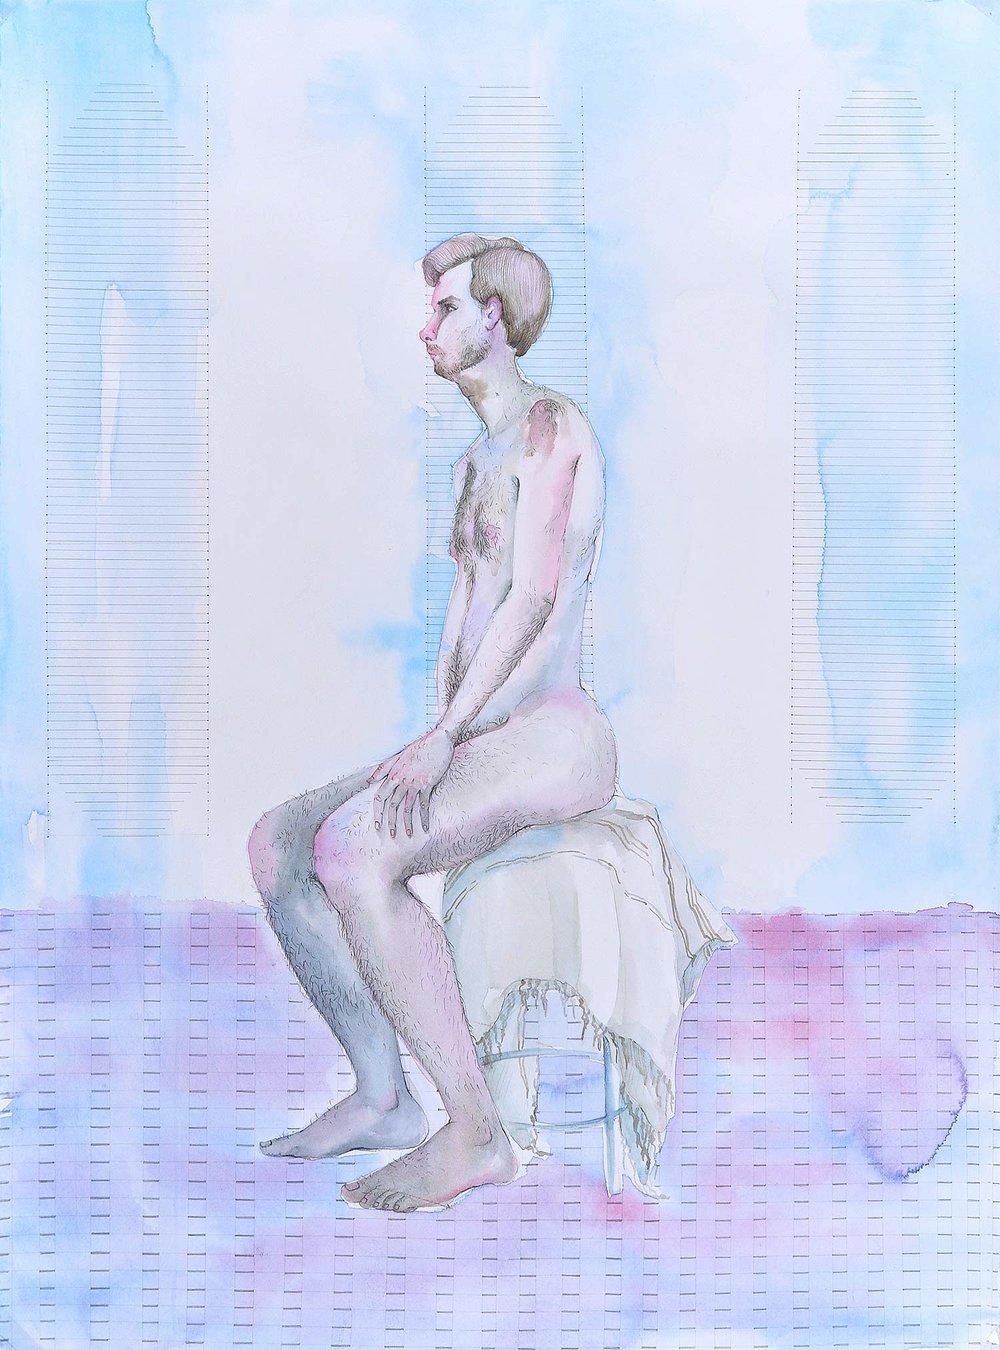 course-figure-drawing-works-09-v01-2018-08.jpg